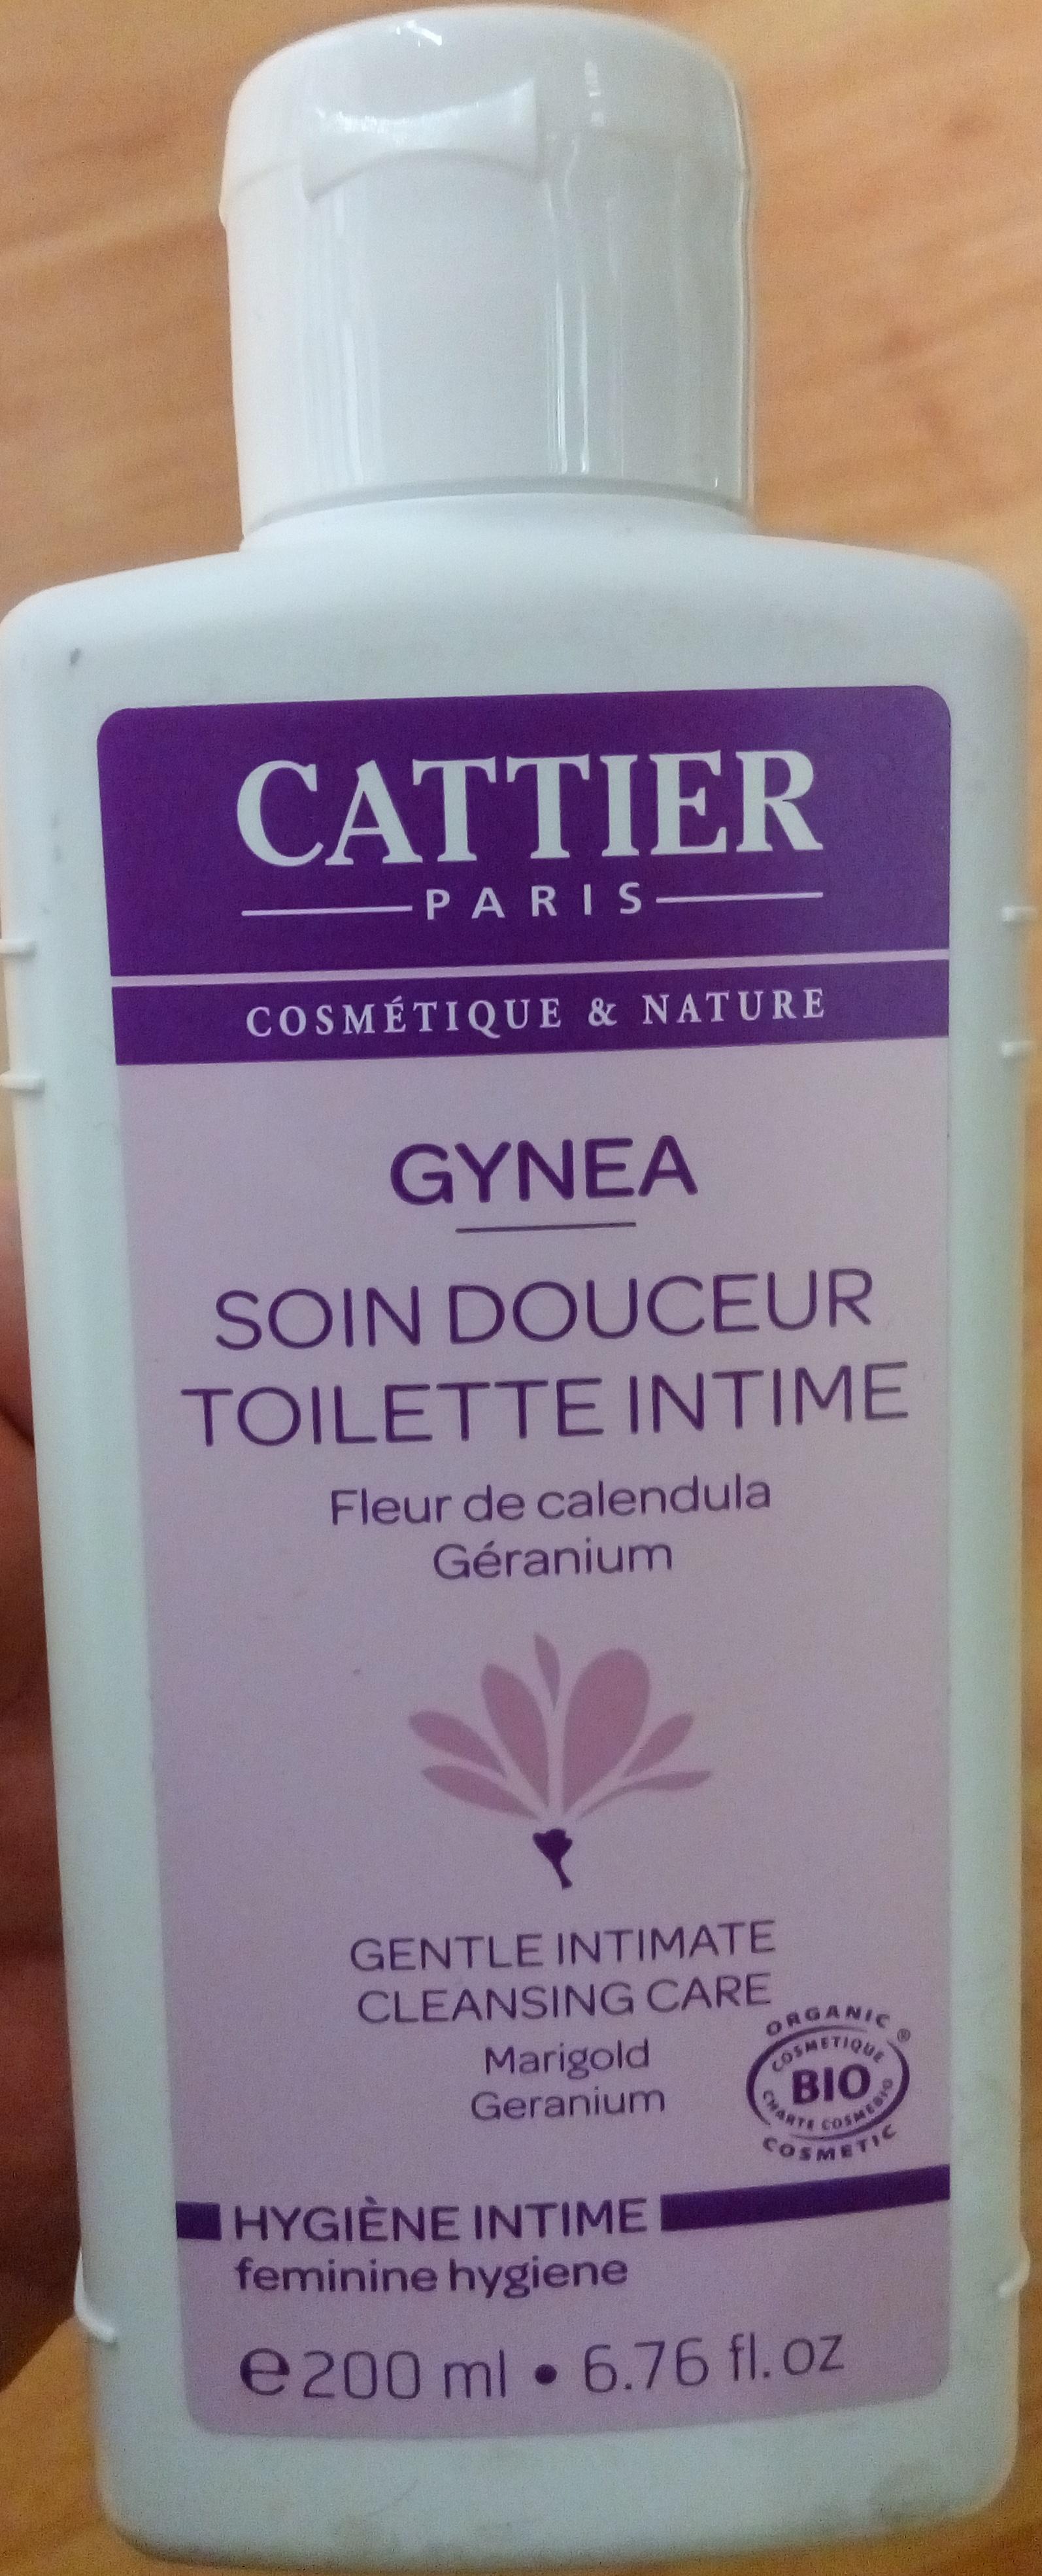 Gynea Soin Douceur Toilette Intime - Product - fr